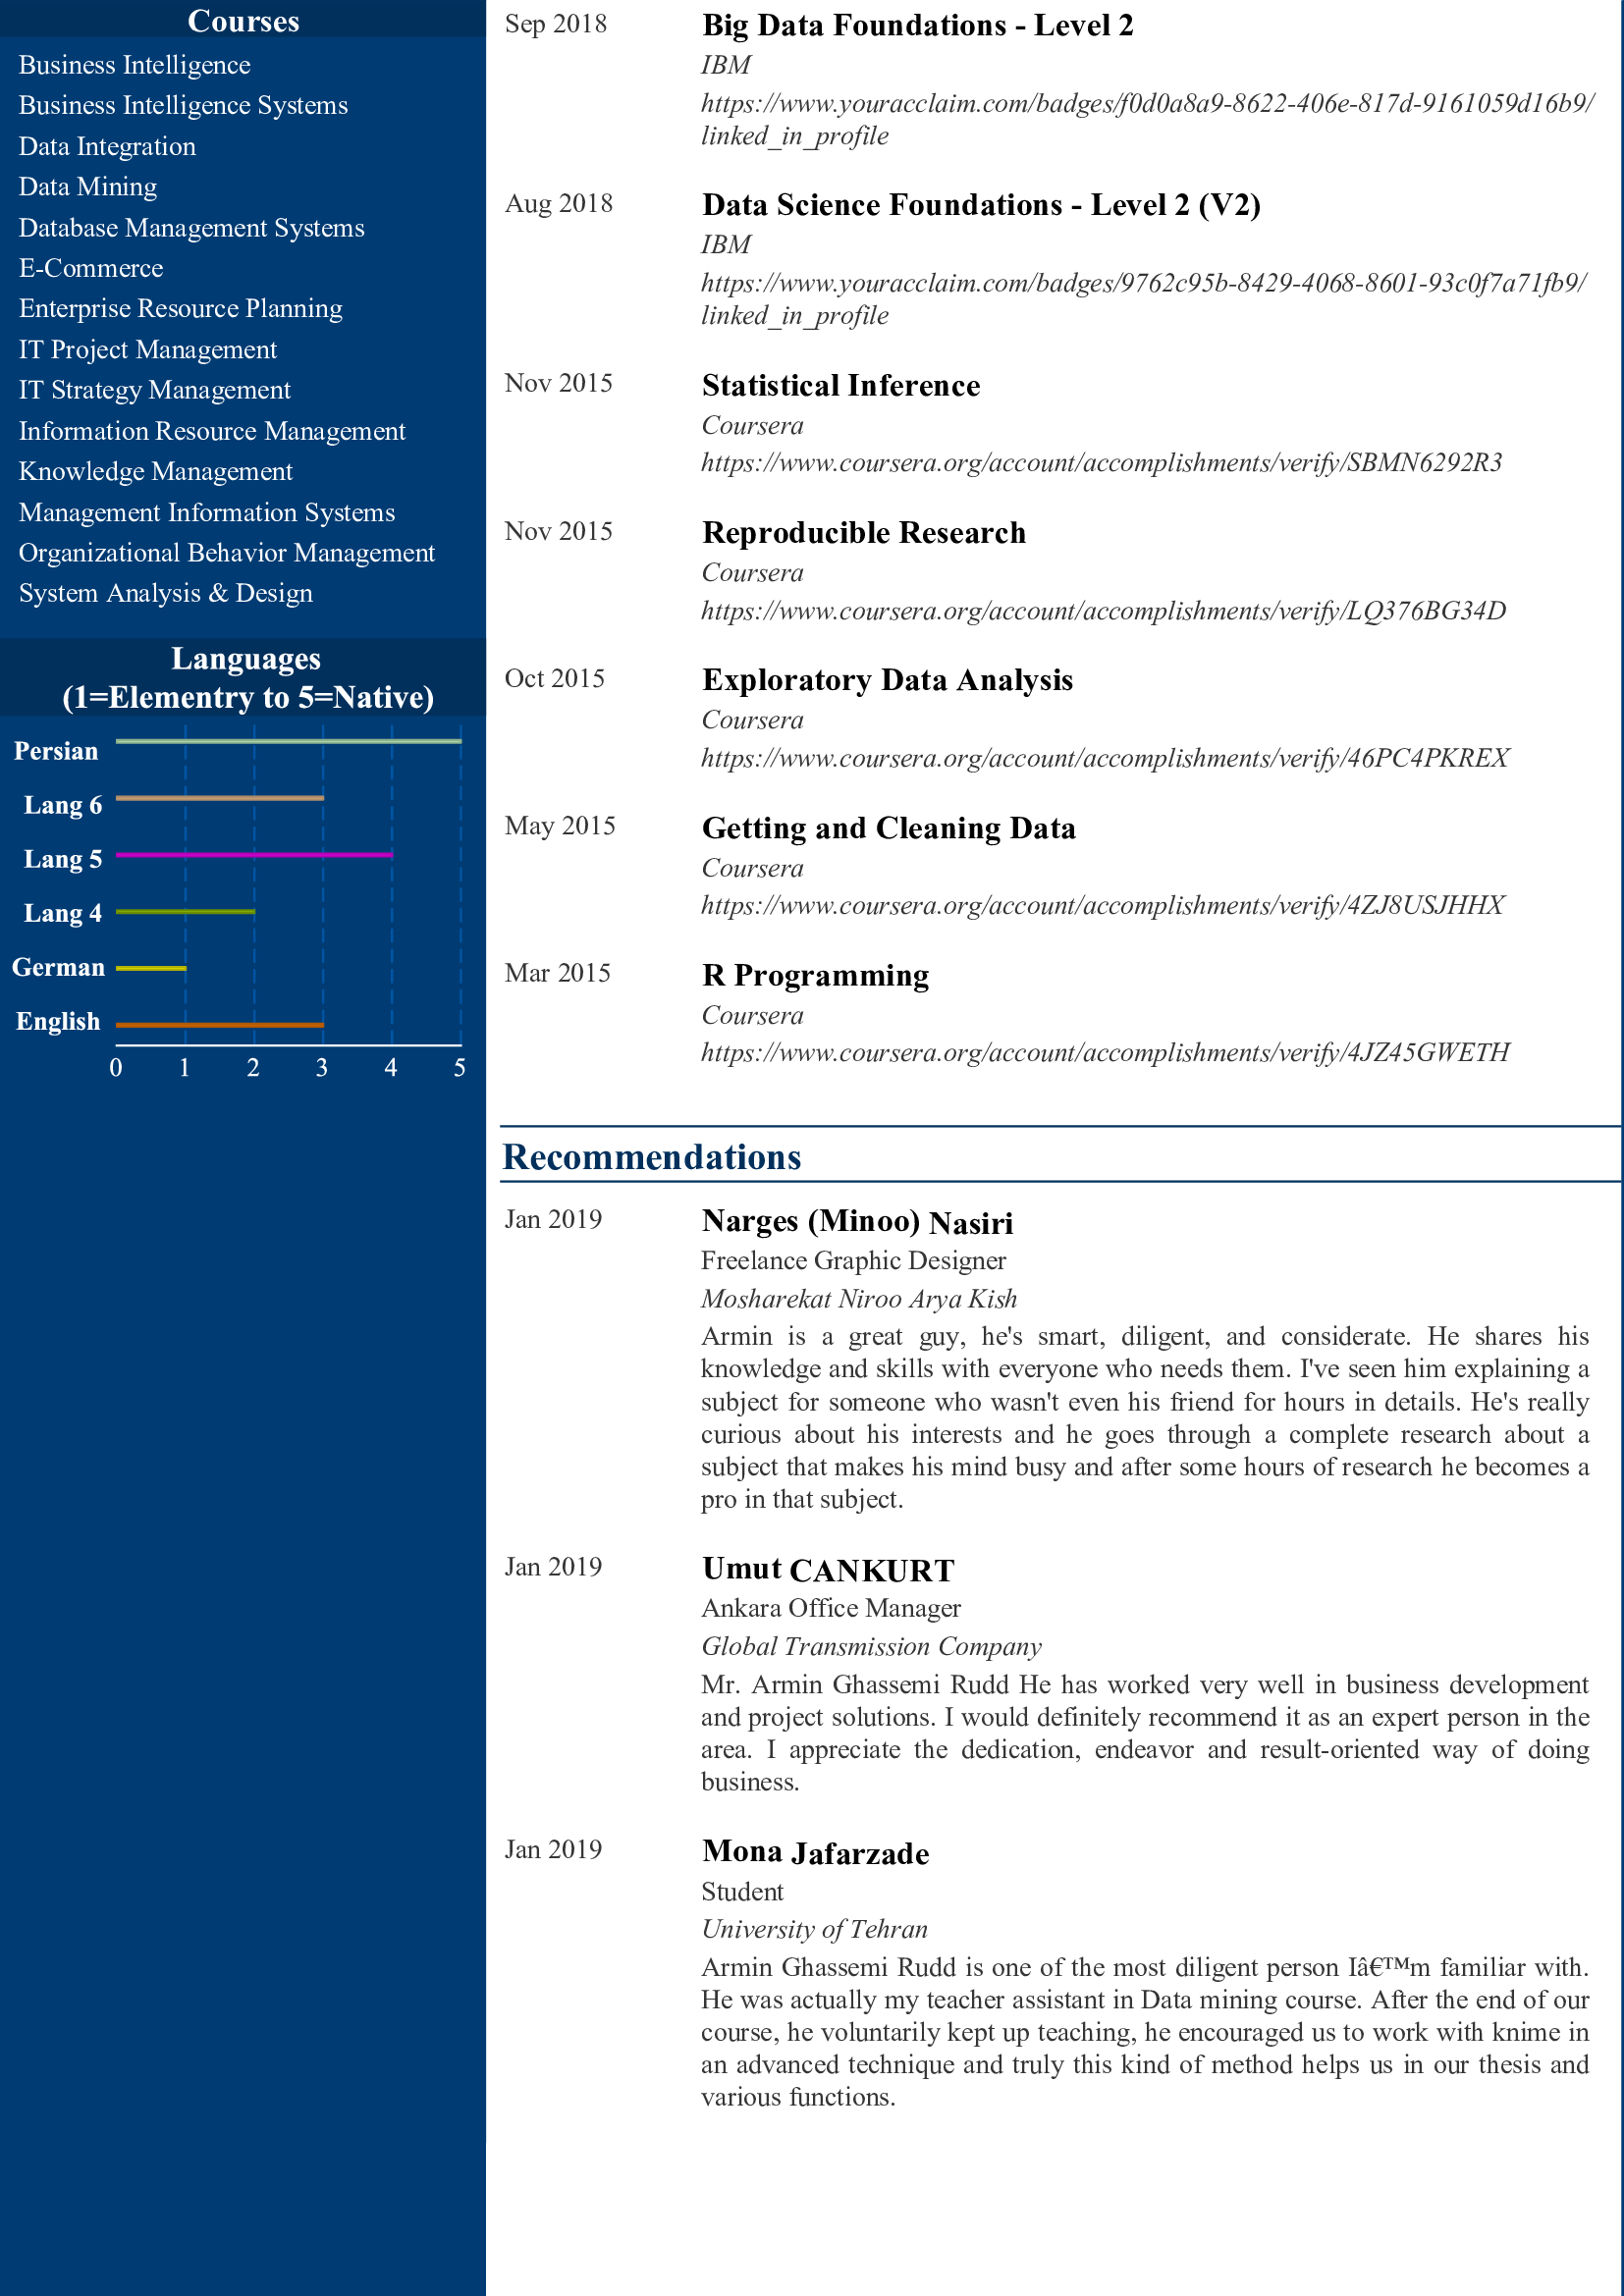 Cv Builder Based On Linkedin Profile Knime Analytics Platform Knime Community Forum